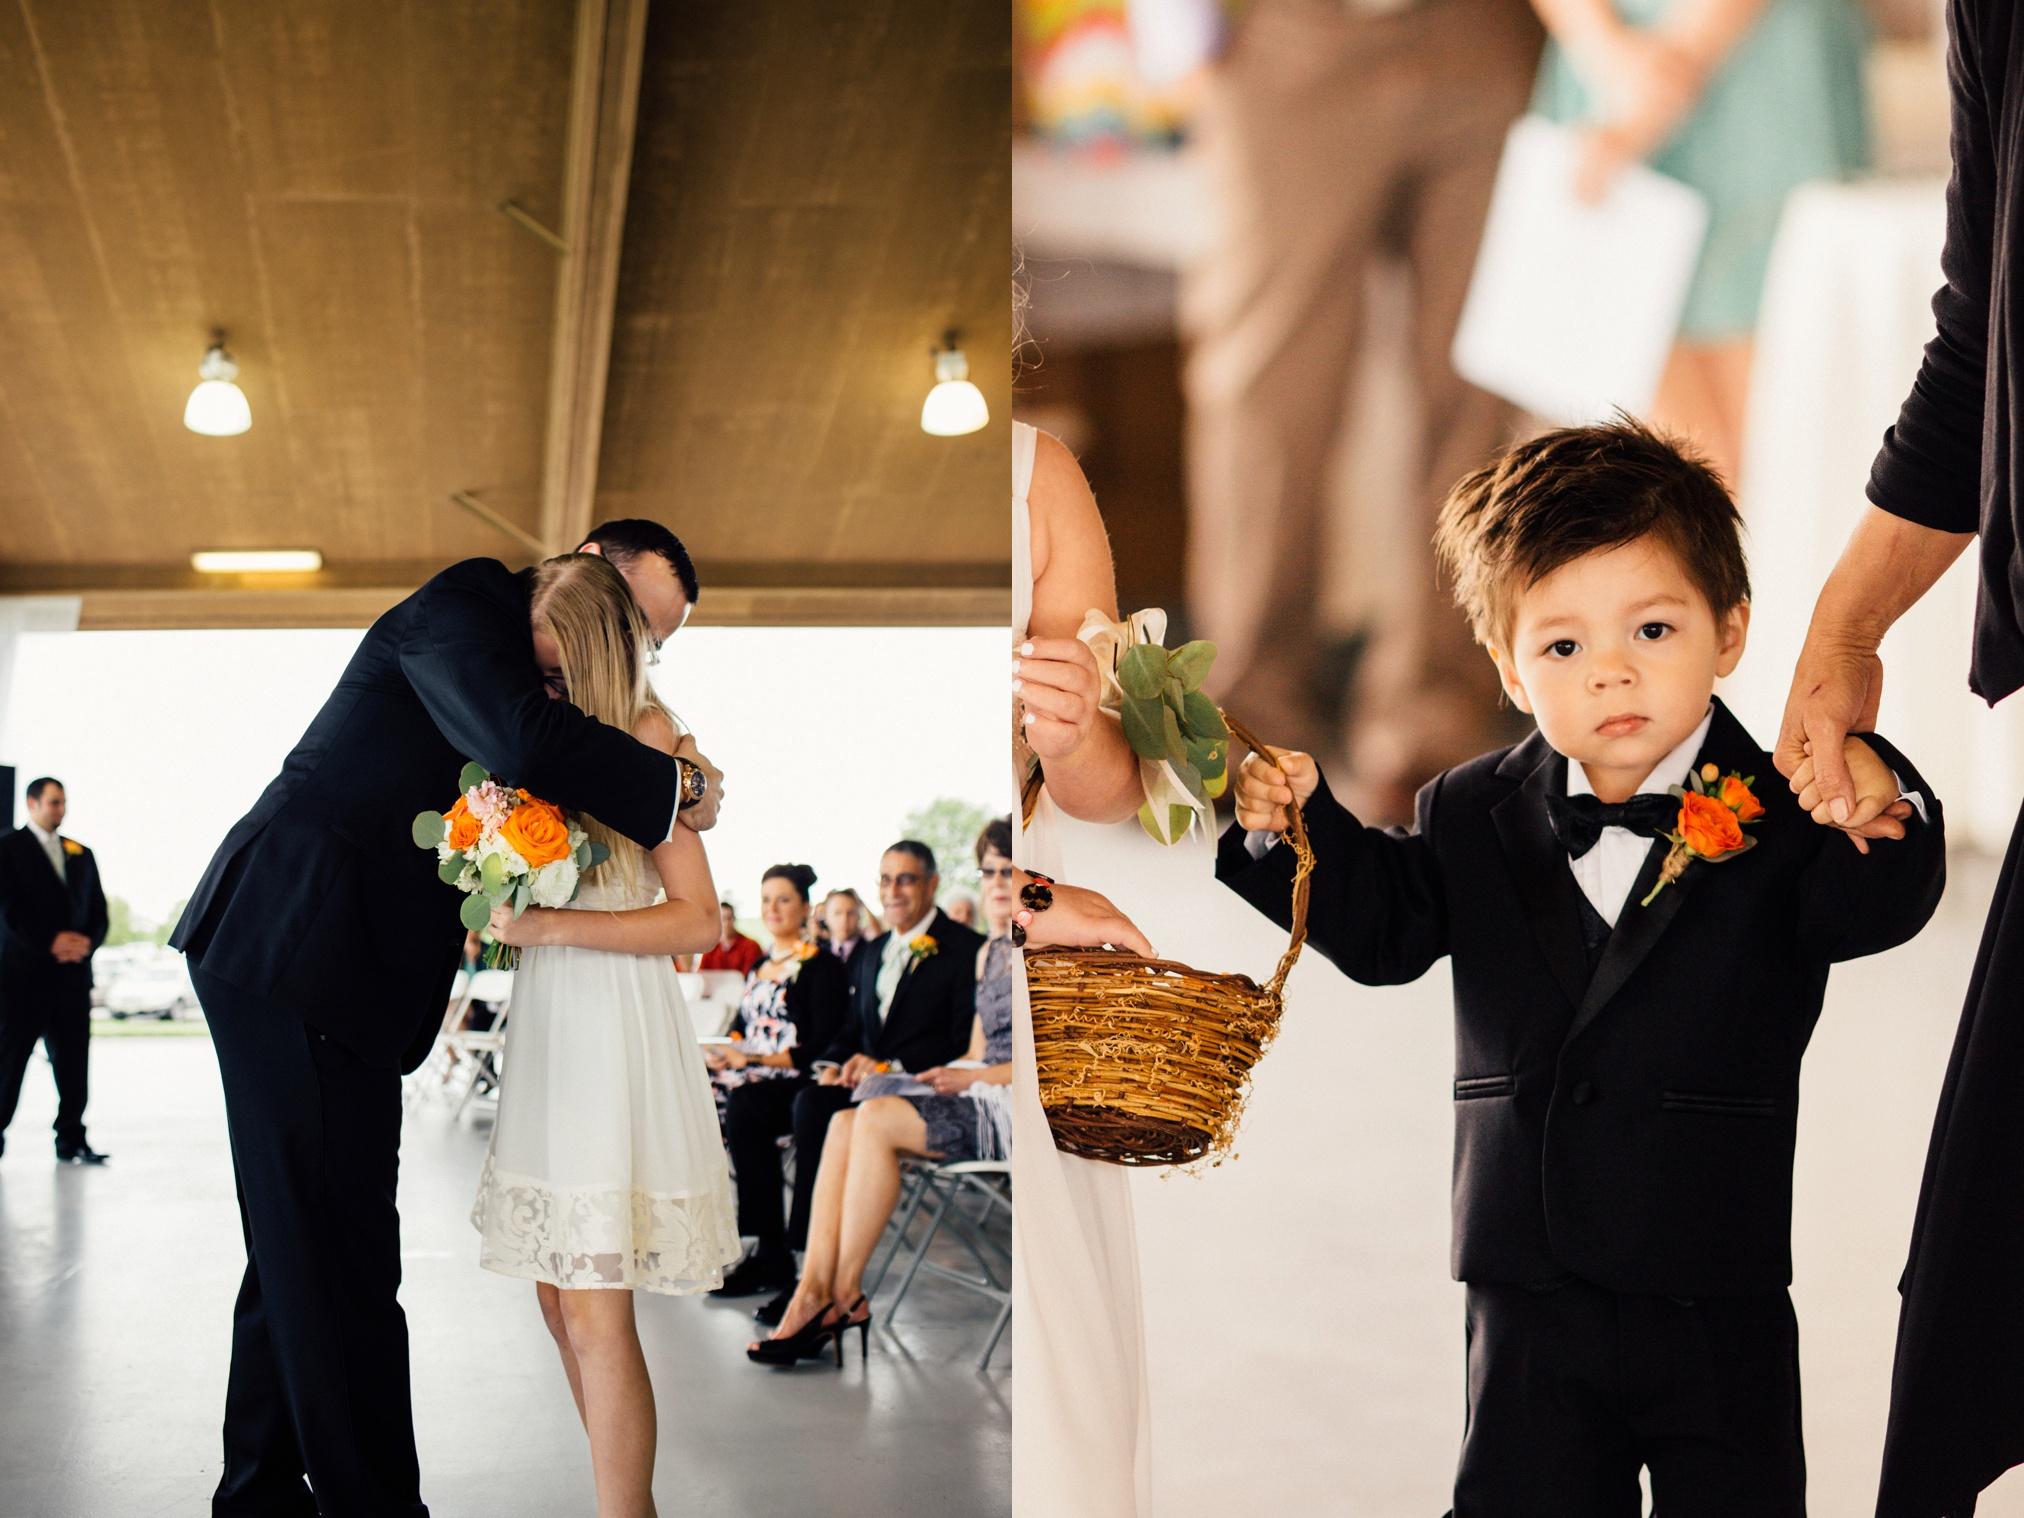 schmid_wedding-358.jpg